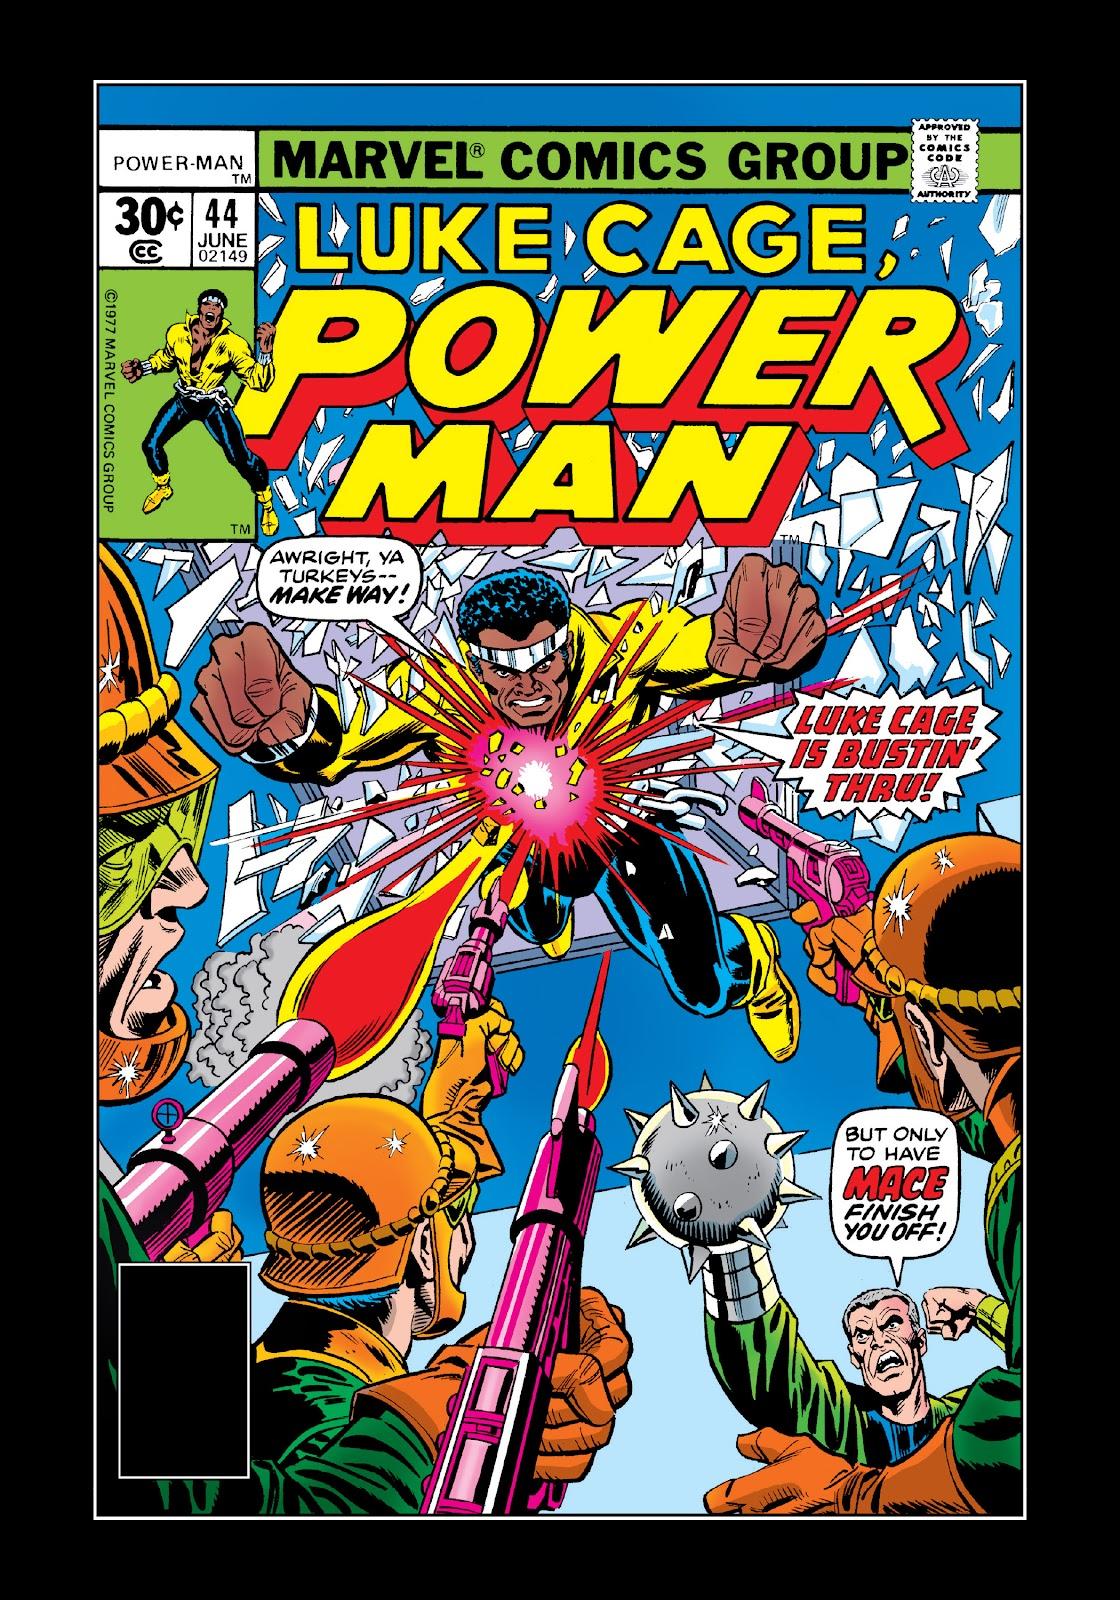 Read online Marvel Masterworks: Luke Cage, Power Man comic -  Issue # TPB 3 (Part 3) - 45